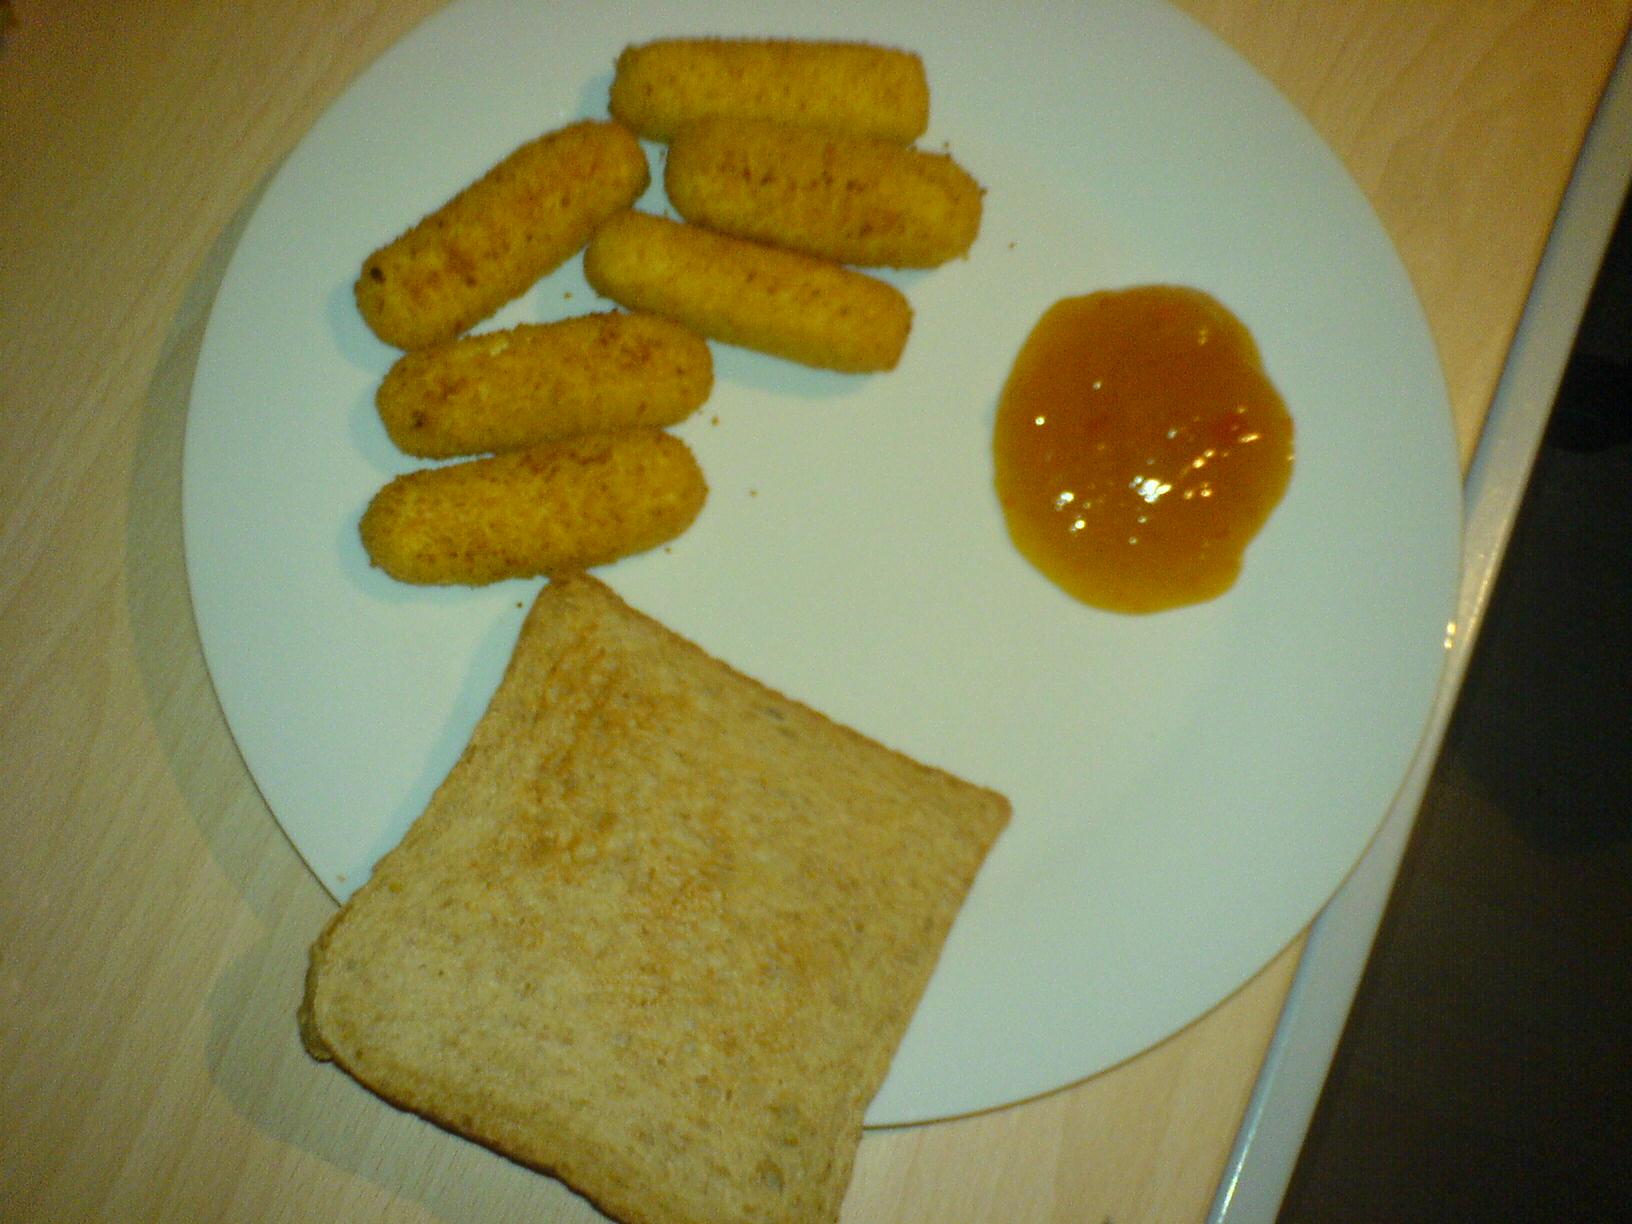 https://foodloader.net/Holz_2008-12-27_Frischkaese-Sticks_mit_Toast.jpg